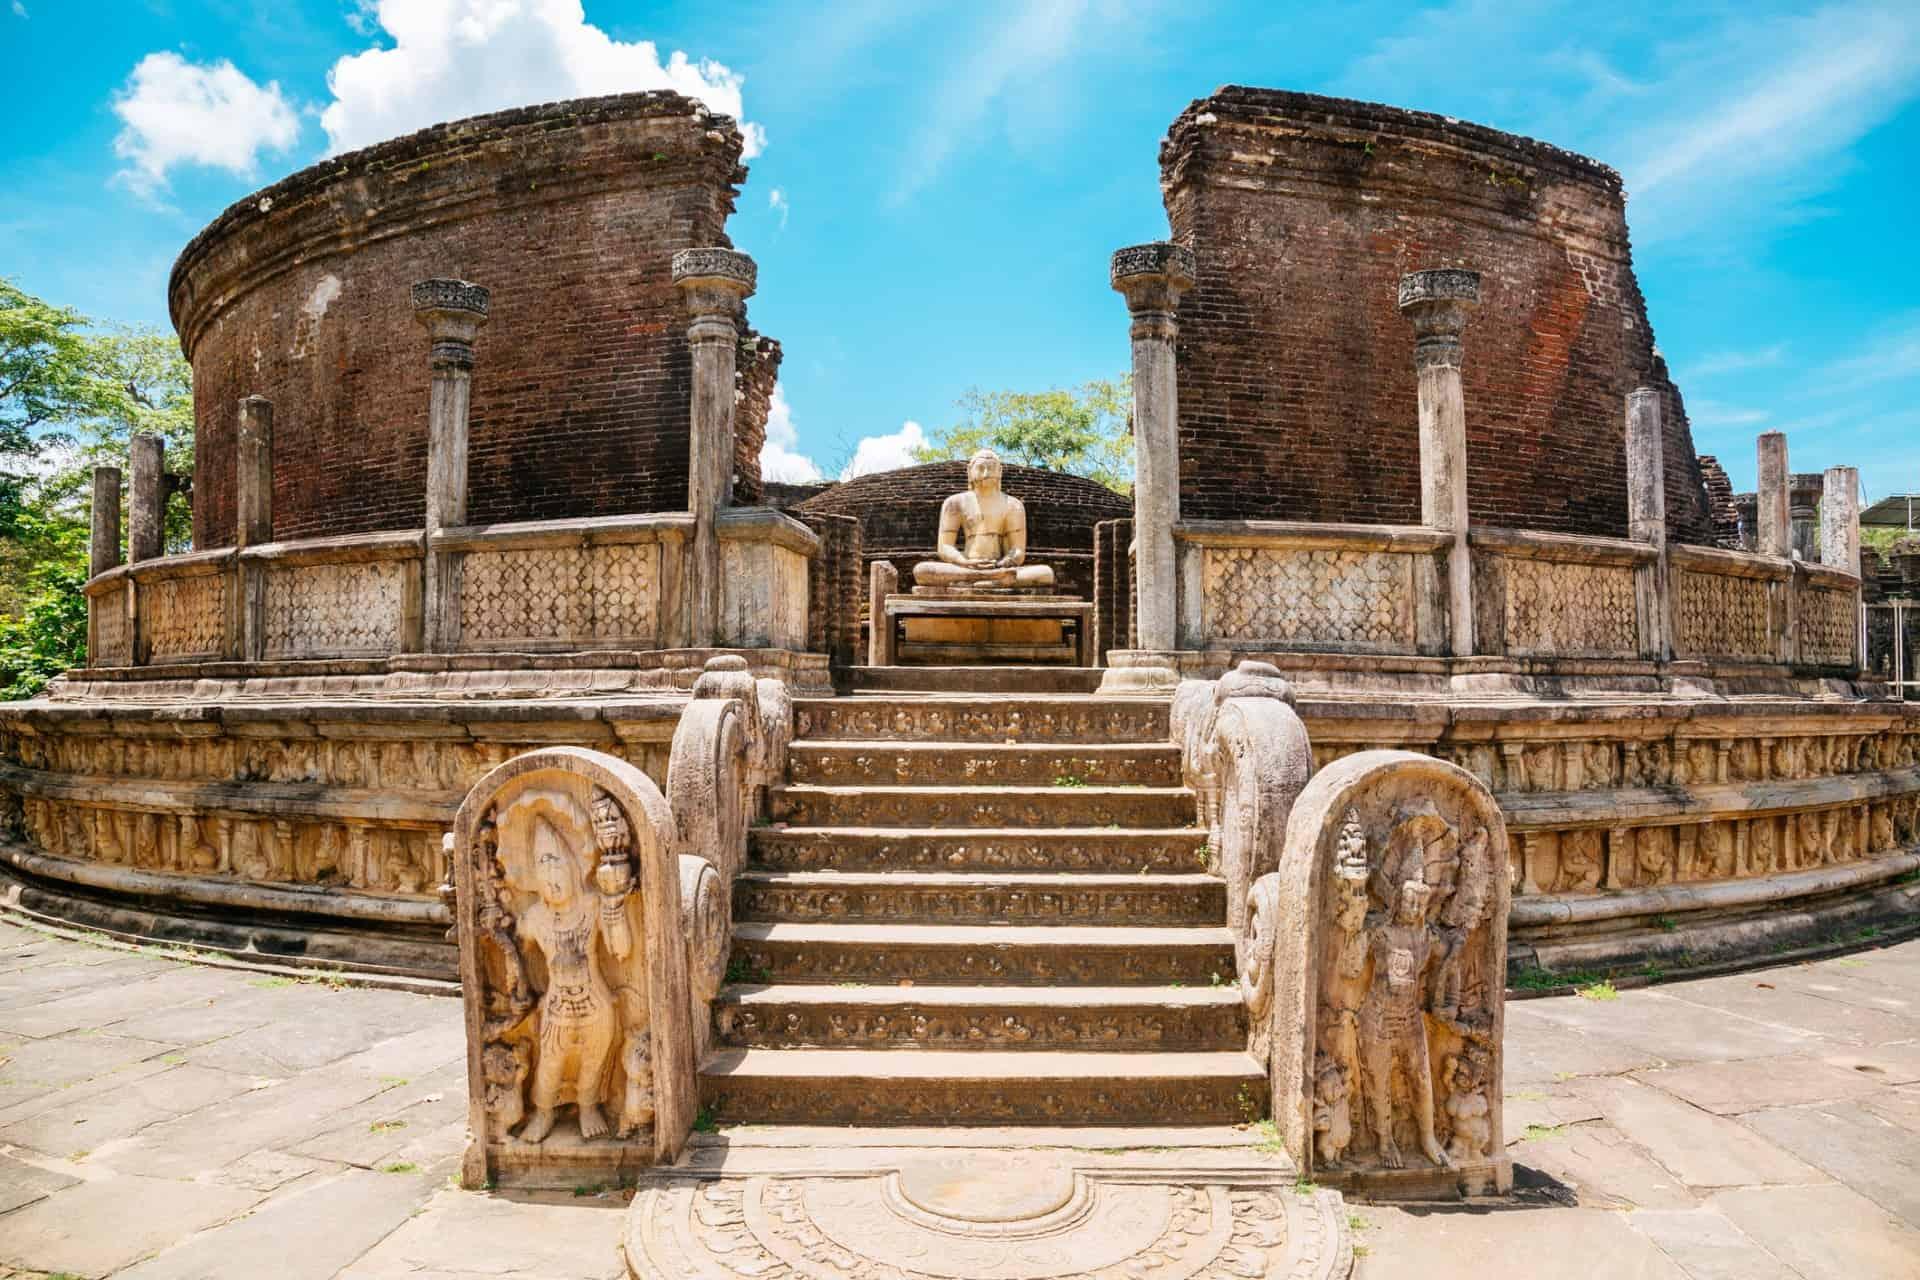 The Vatadage temple in Polonnaruwa Sri Lanka